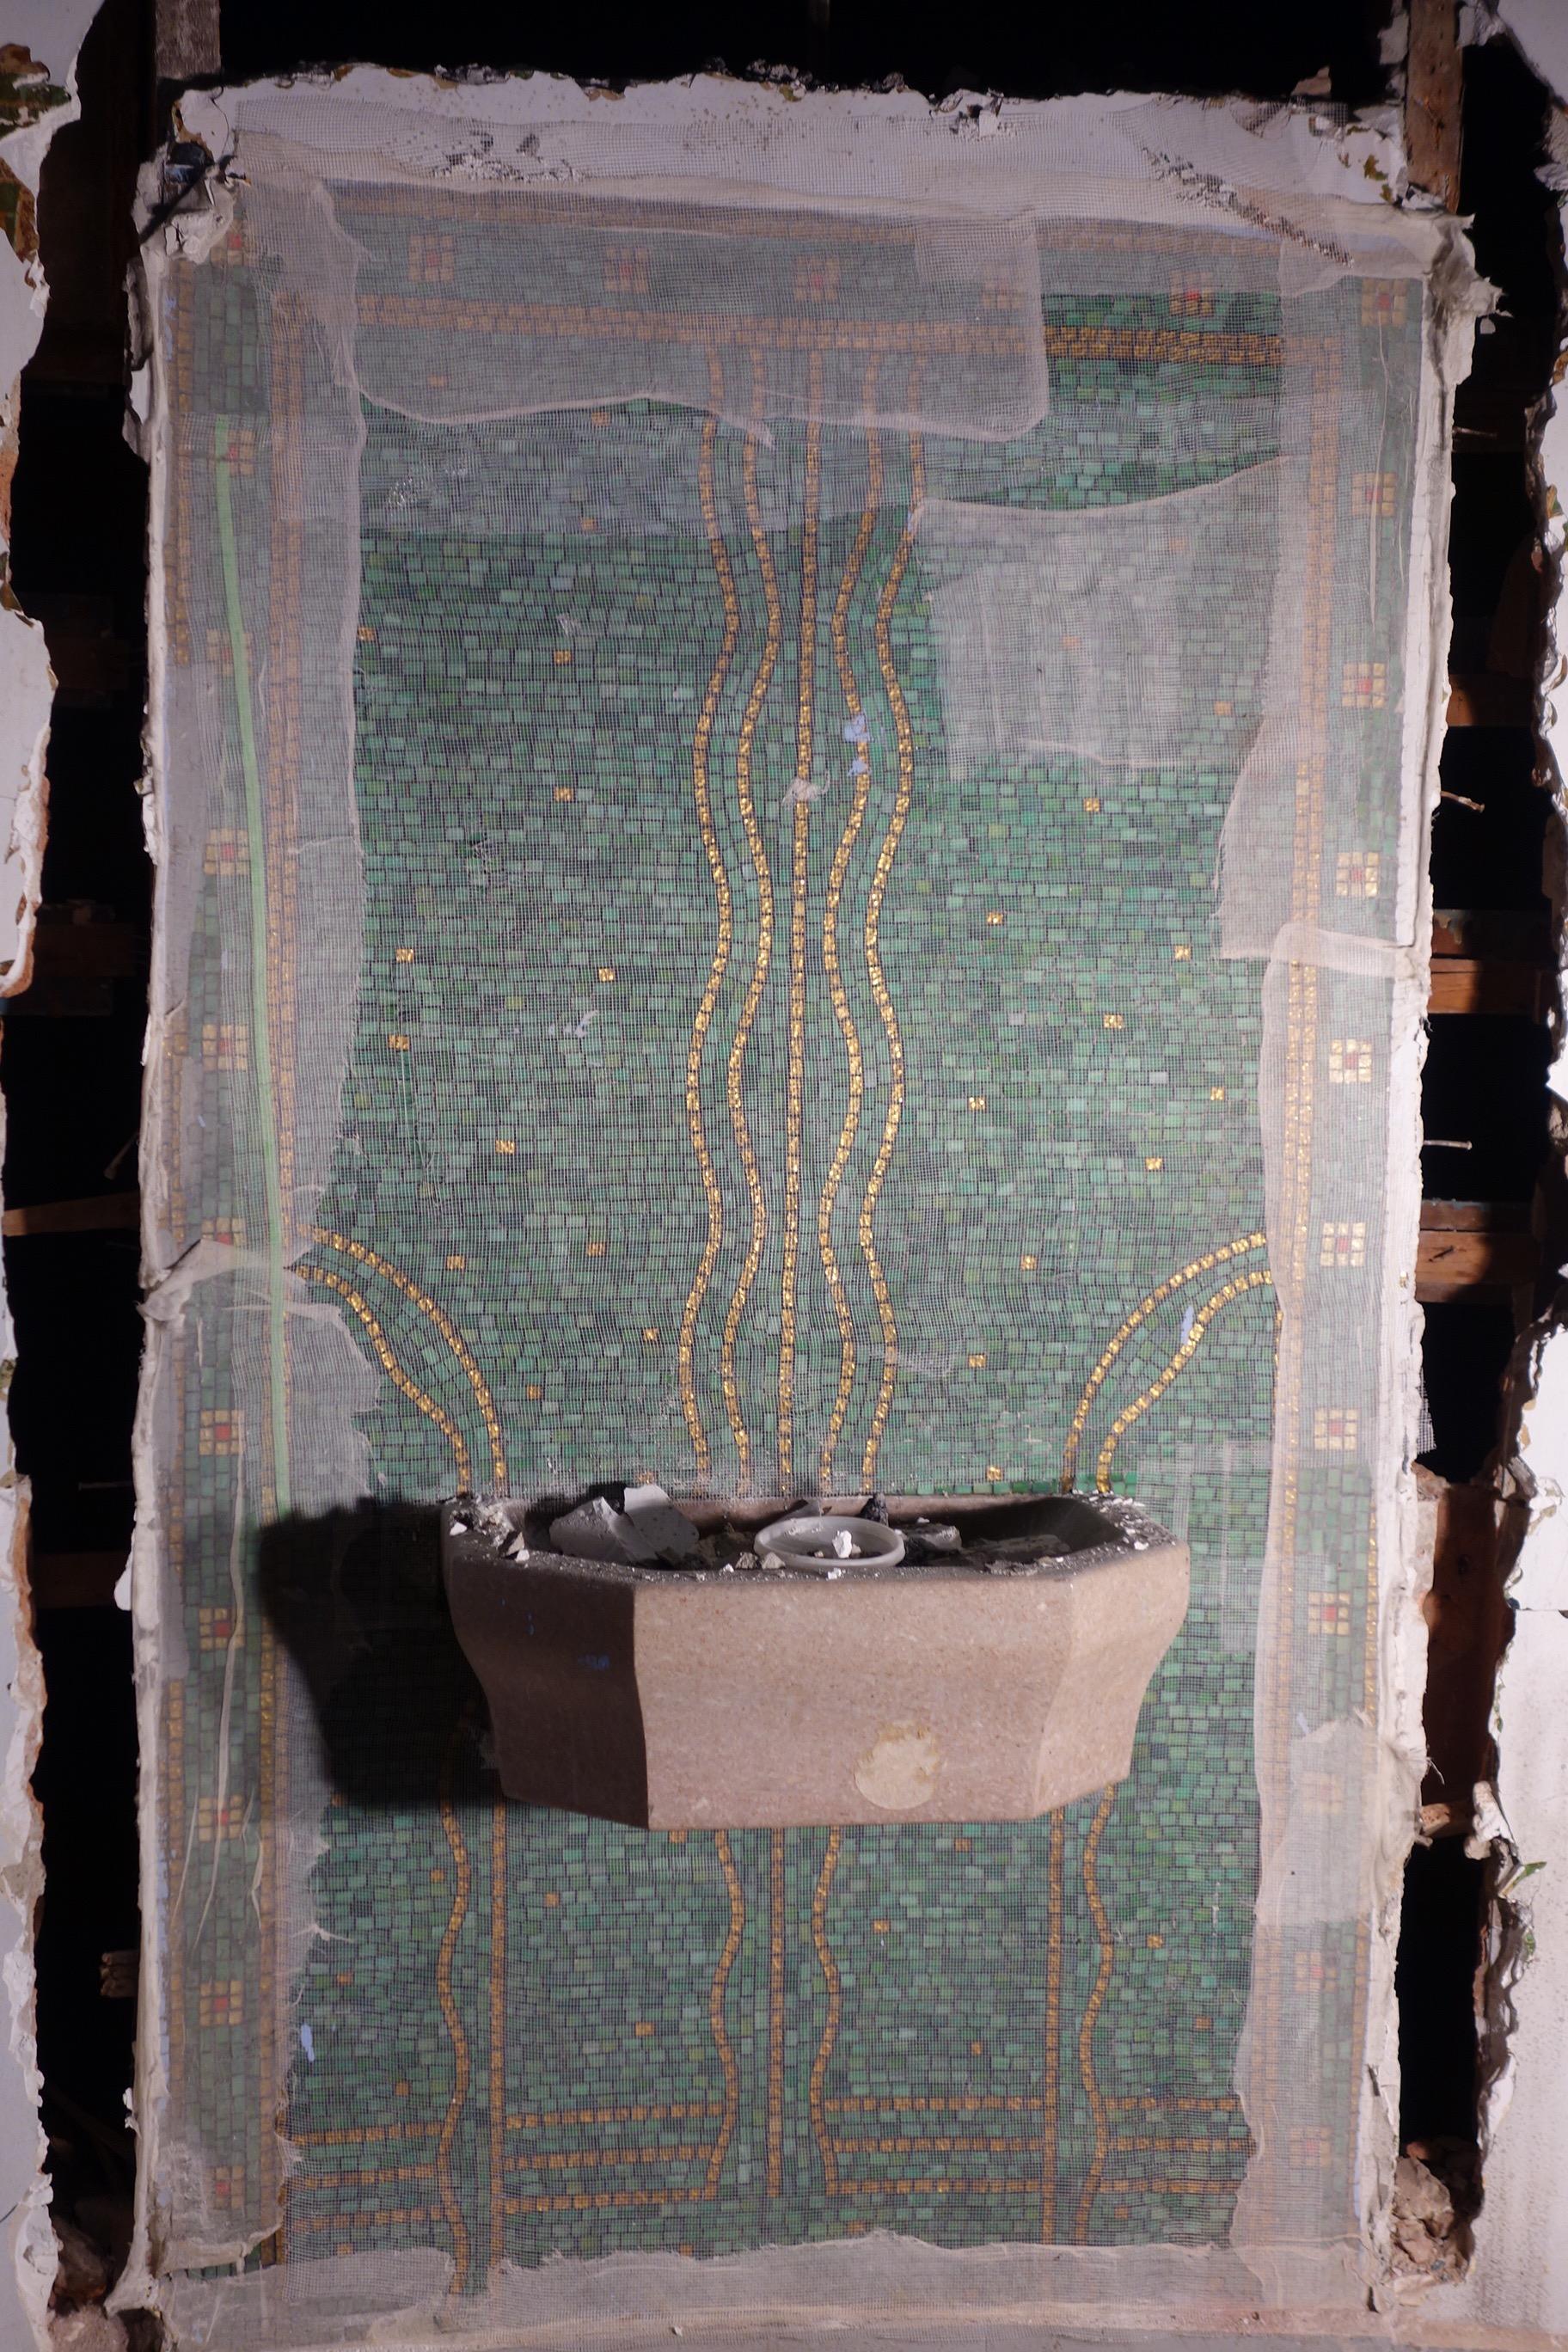 Glass Mosaic Fountain - Deinstallation